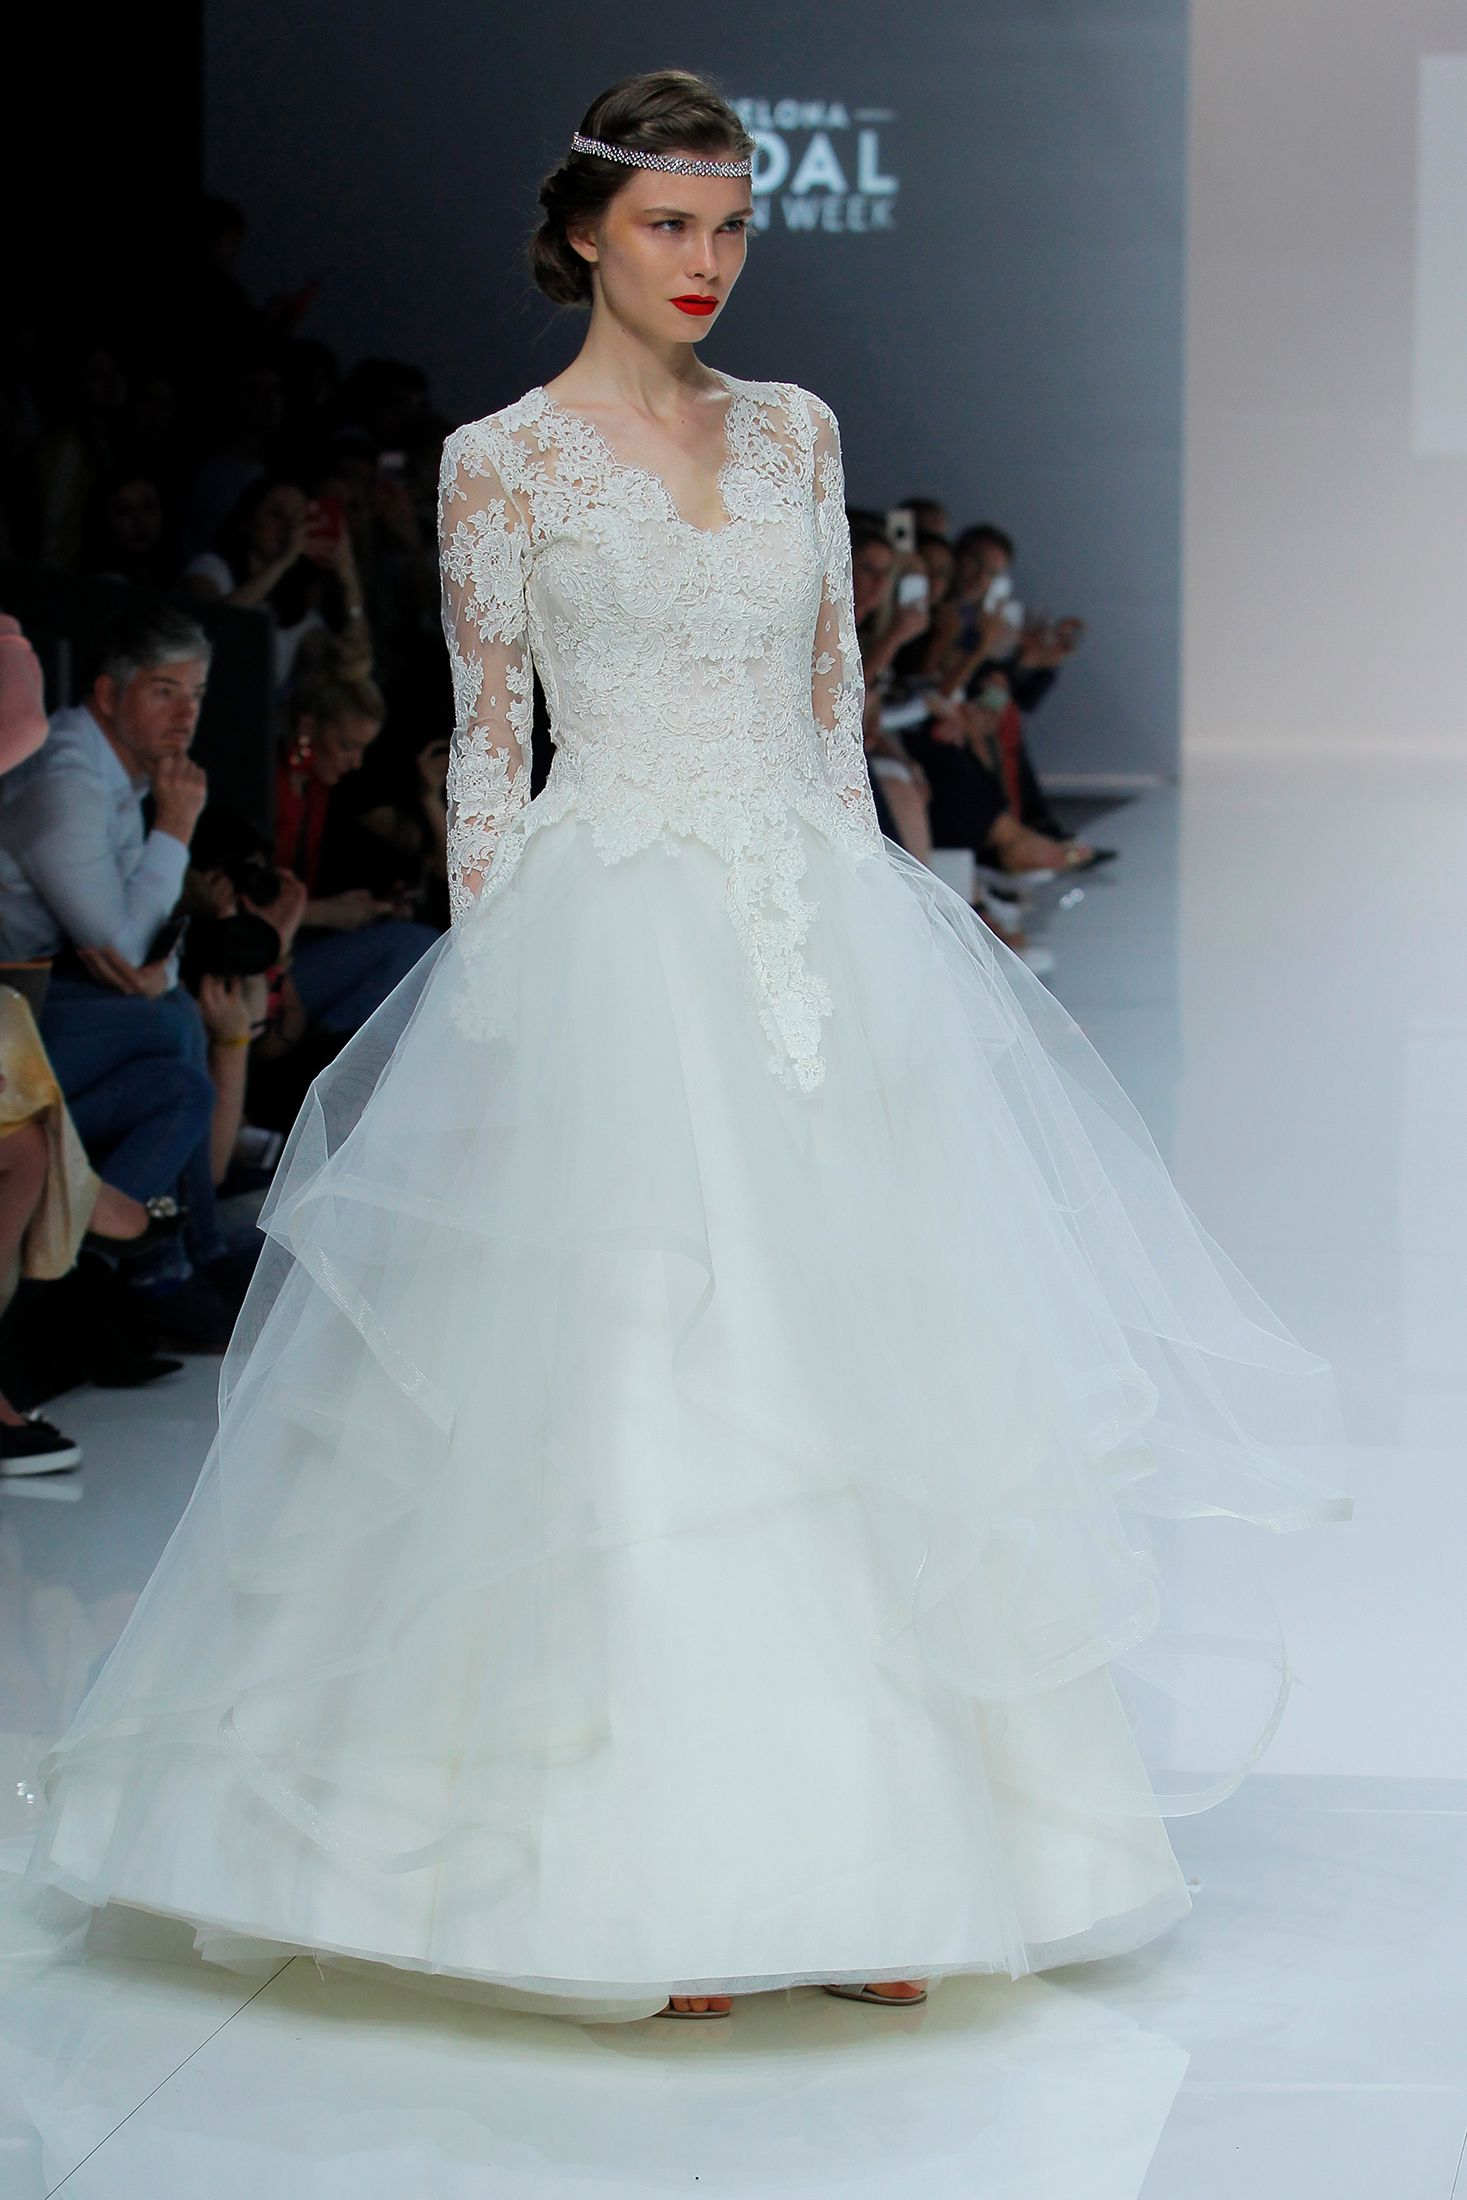 Vestido de Novia de Cymbeline - CY 079 #wedding #bodas #boda ...